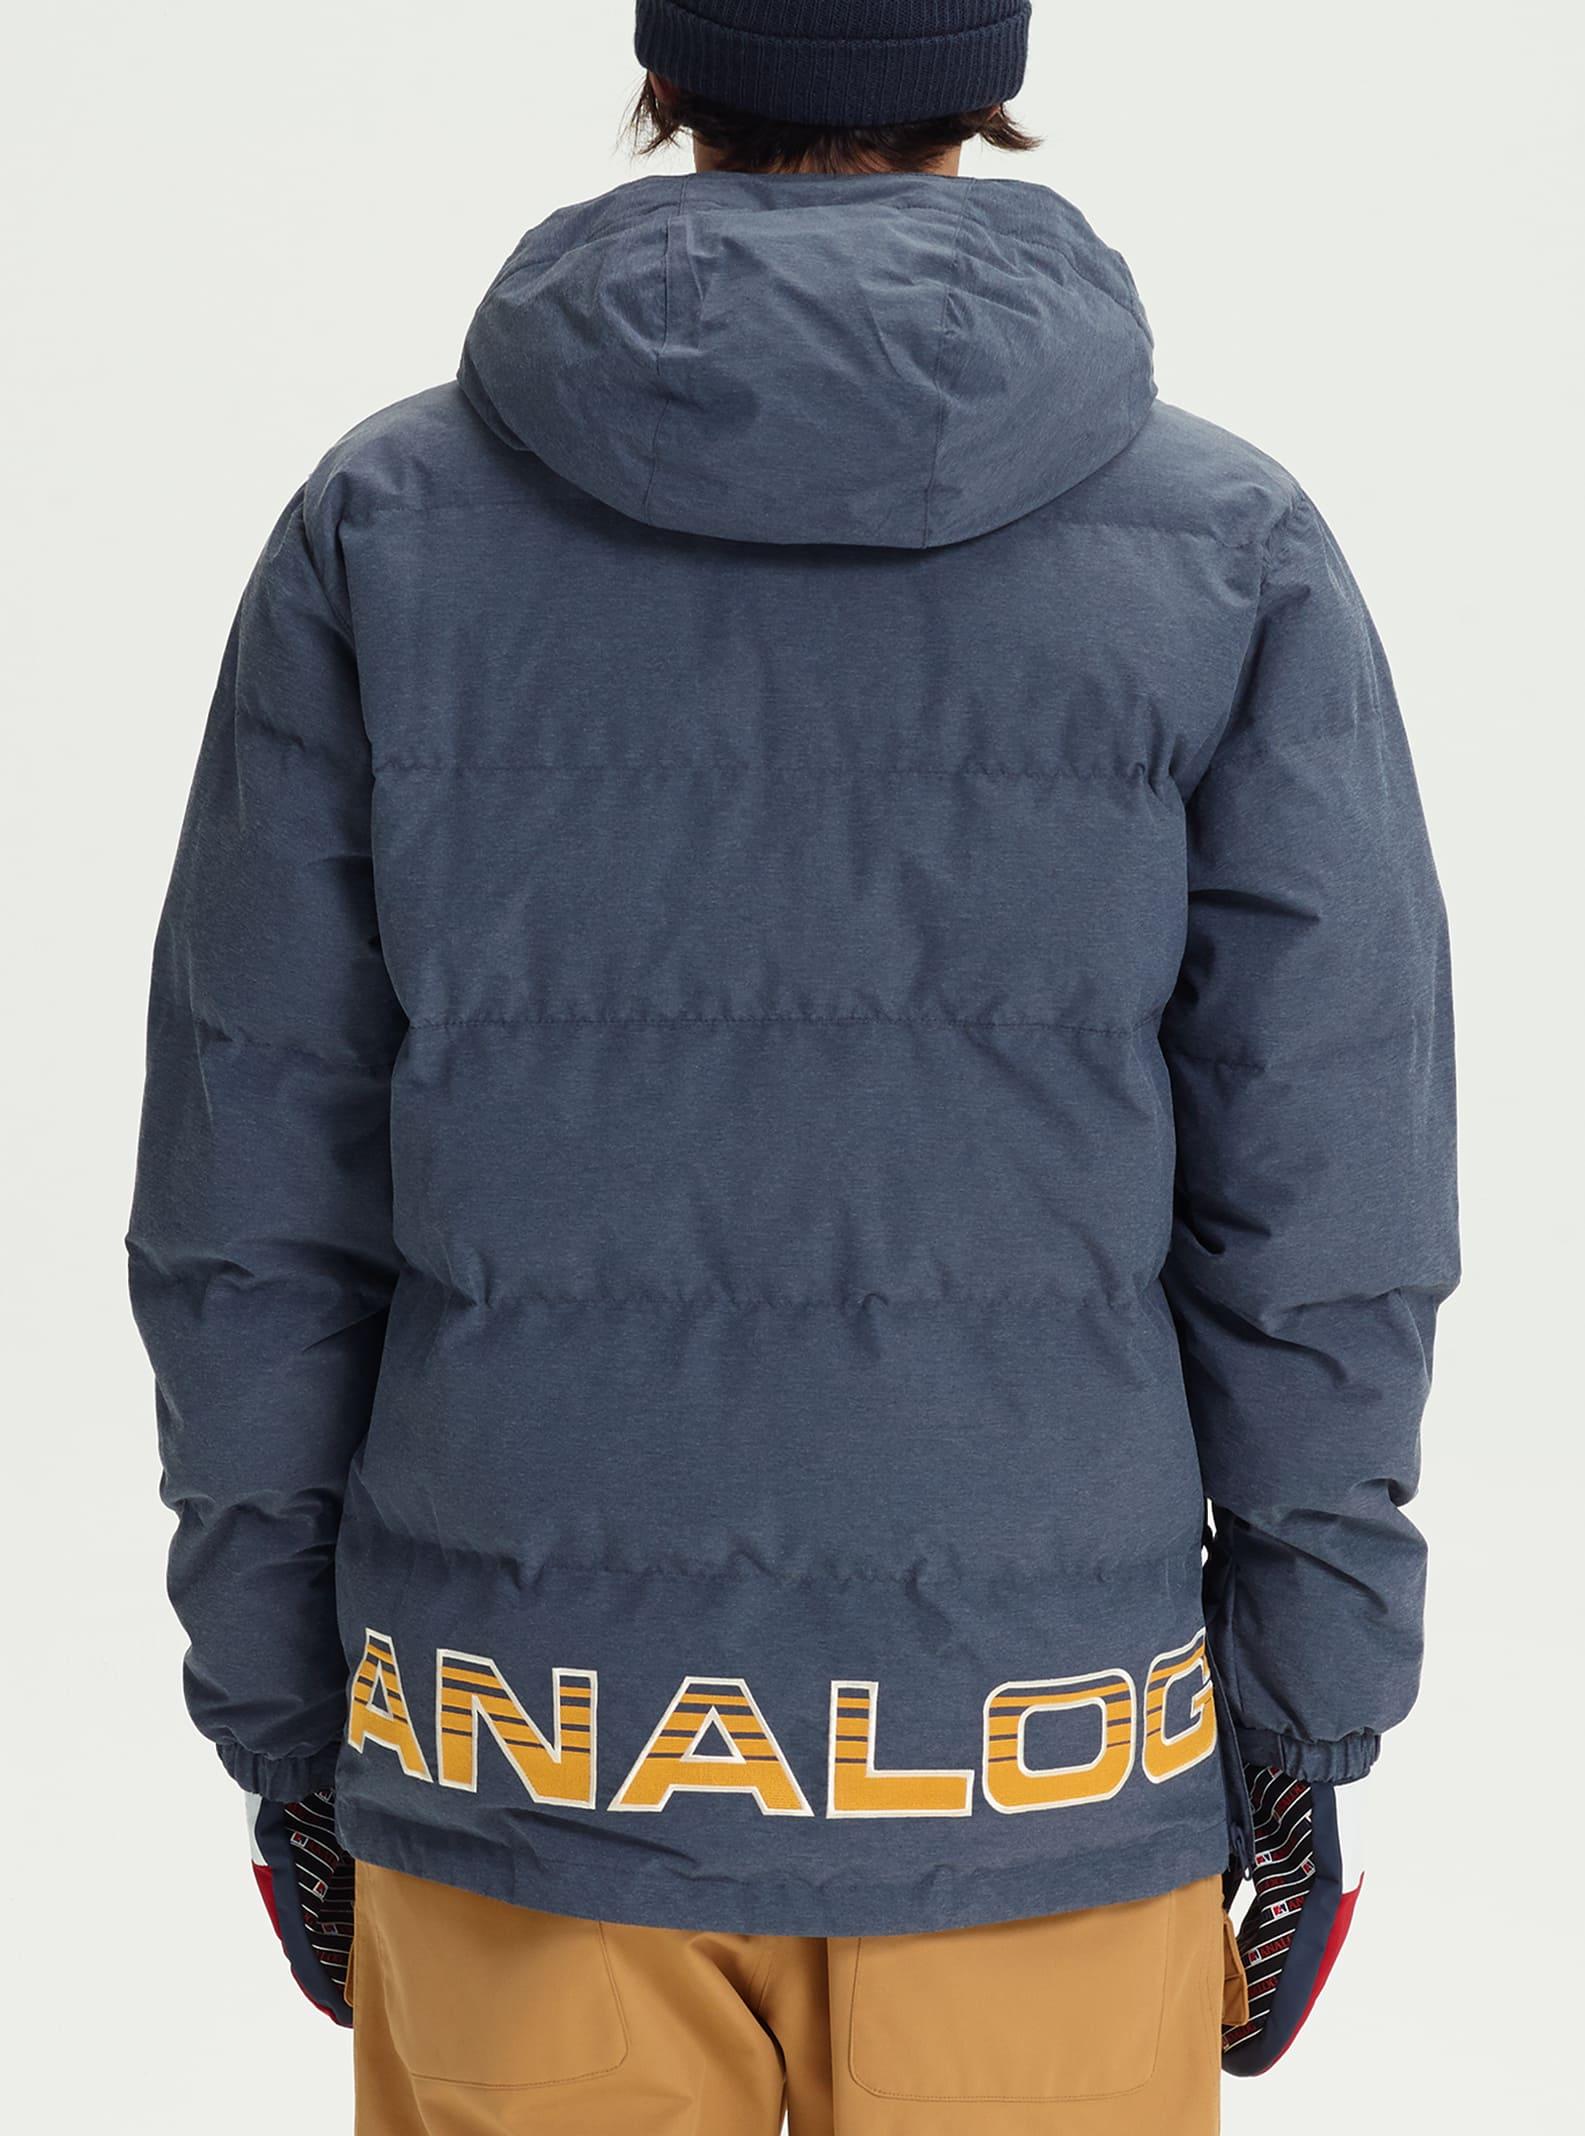 1157dfbbcc4e2 Men's Snowboard Jackets | Burton Snowboards